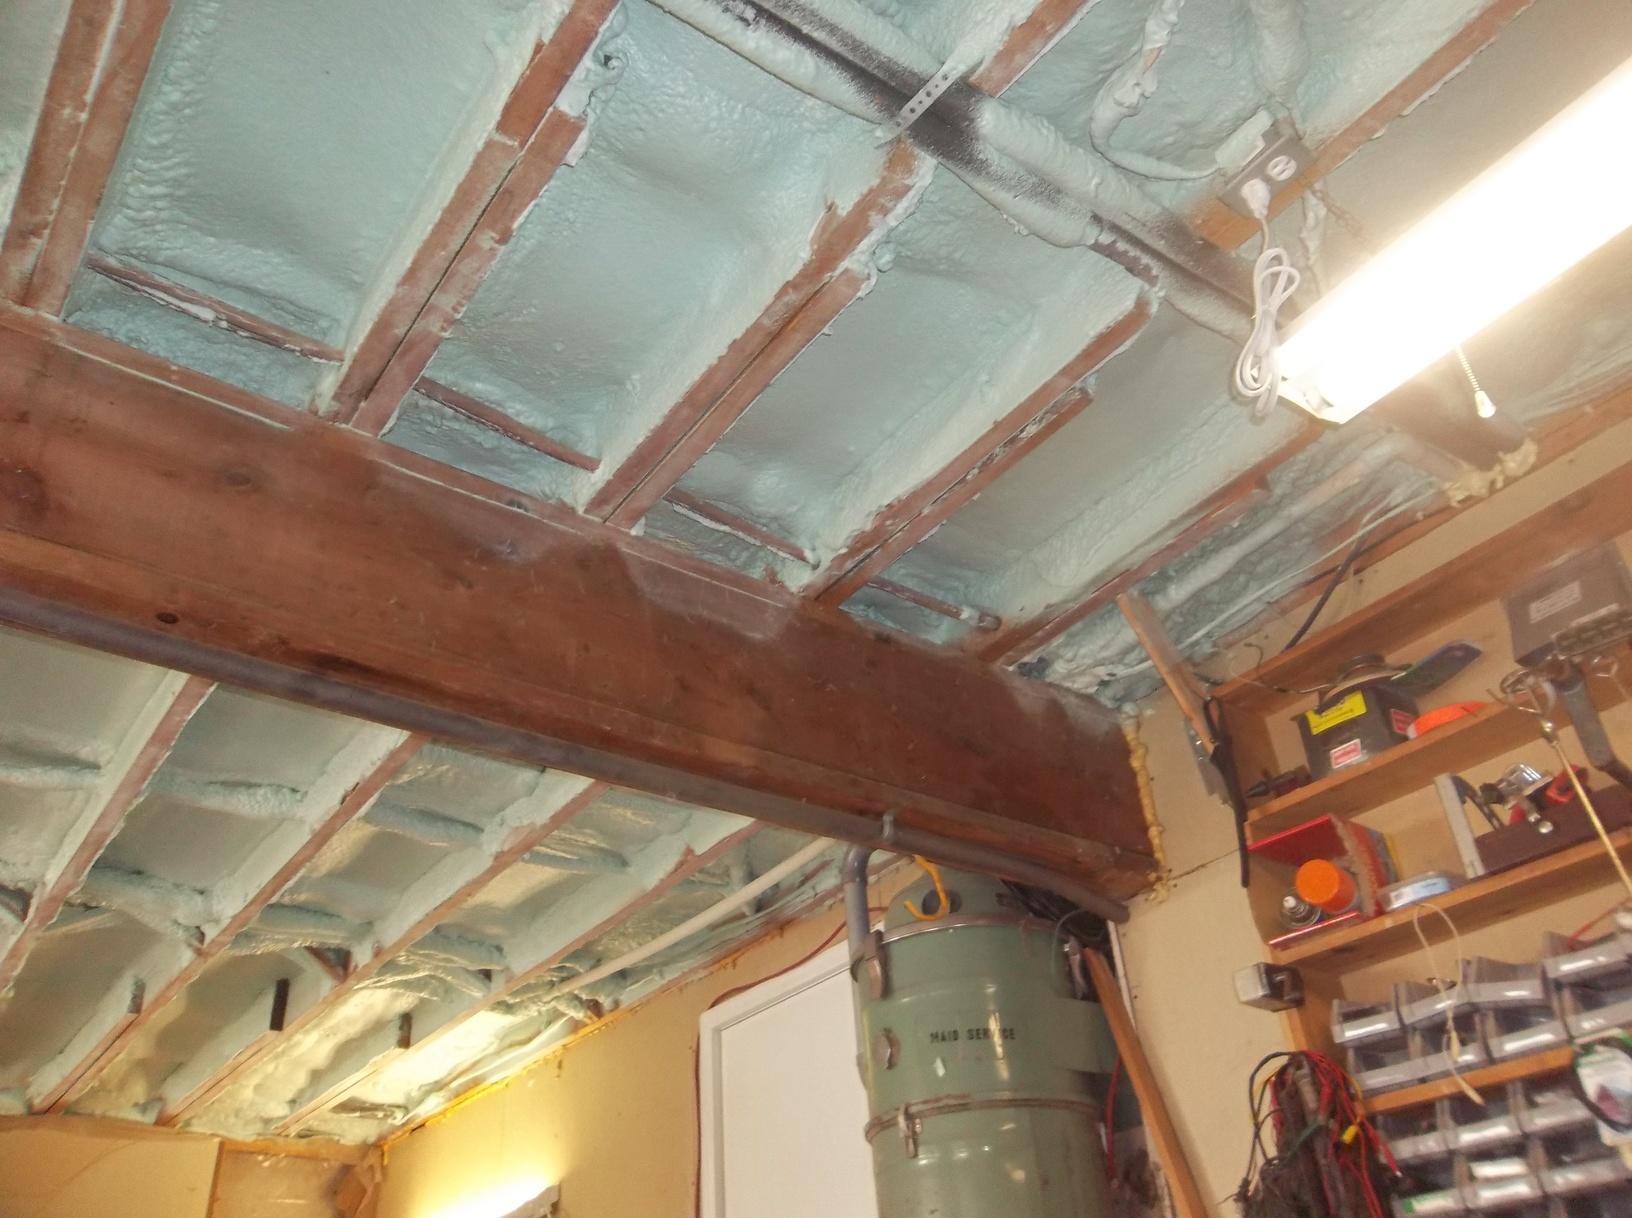 Garage Ceiling with newly installed Spray Foam Insulation